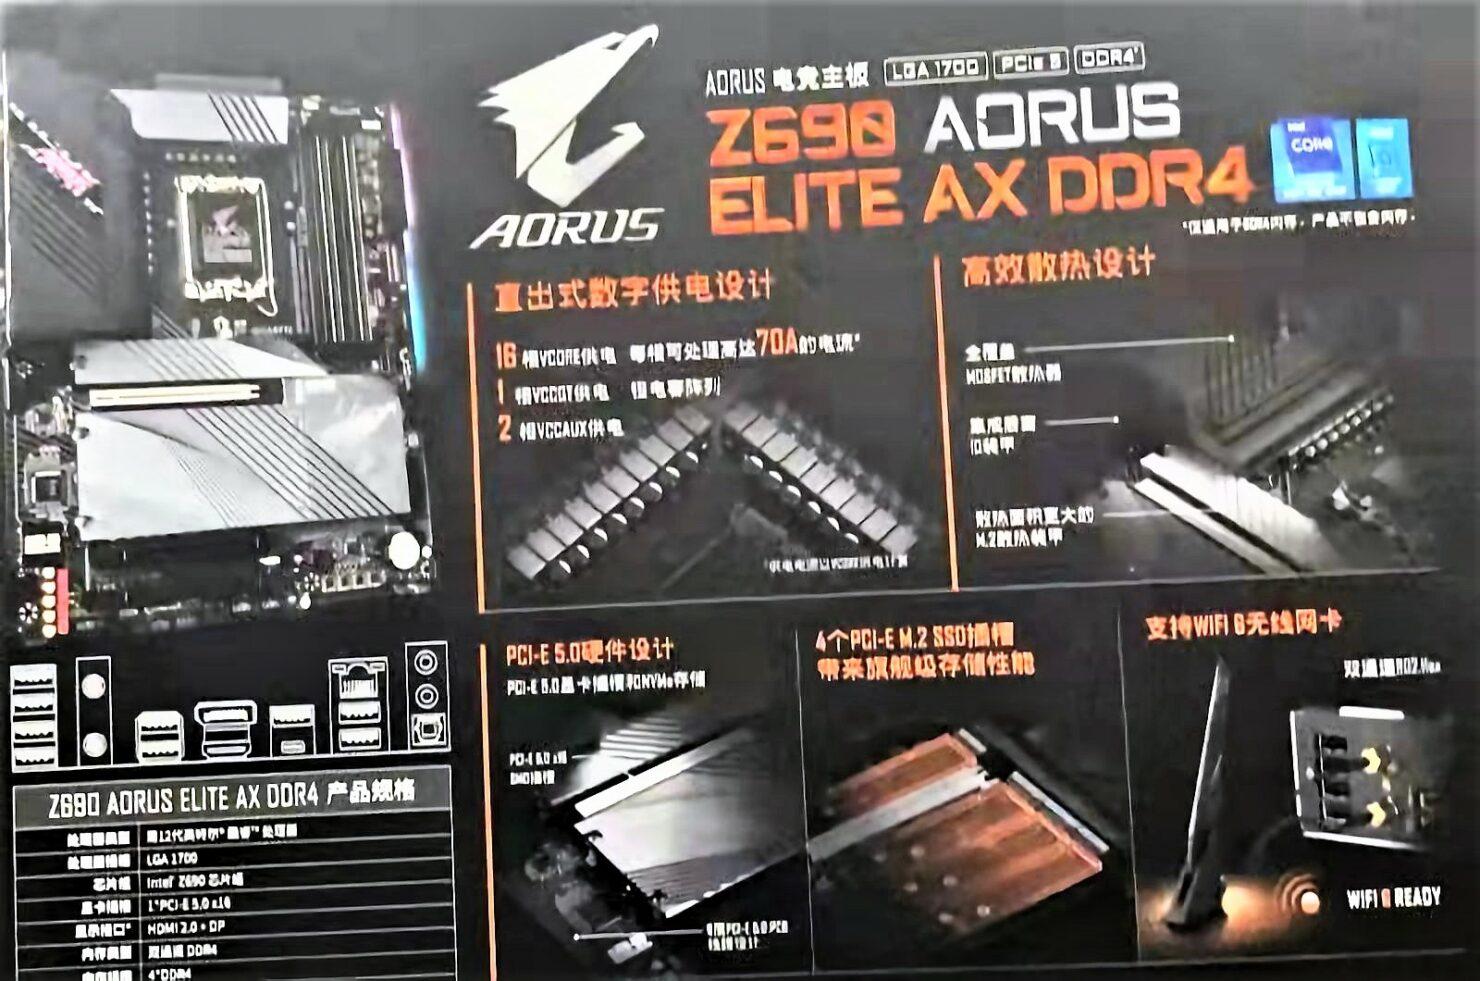 Gigabyte Z690 AORUS Elite AX DDR4 Motherboard Pictured, LGA 1700 Socket With 16 Phase VRM For Intel Alder Lake CPUs